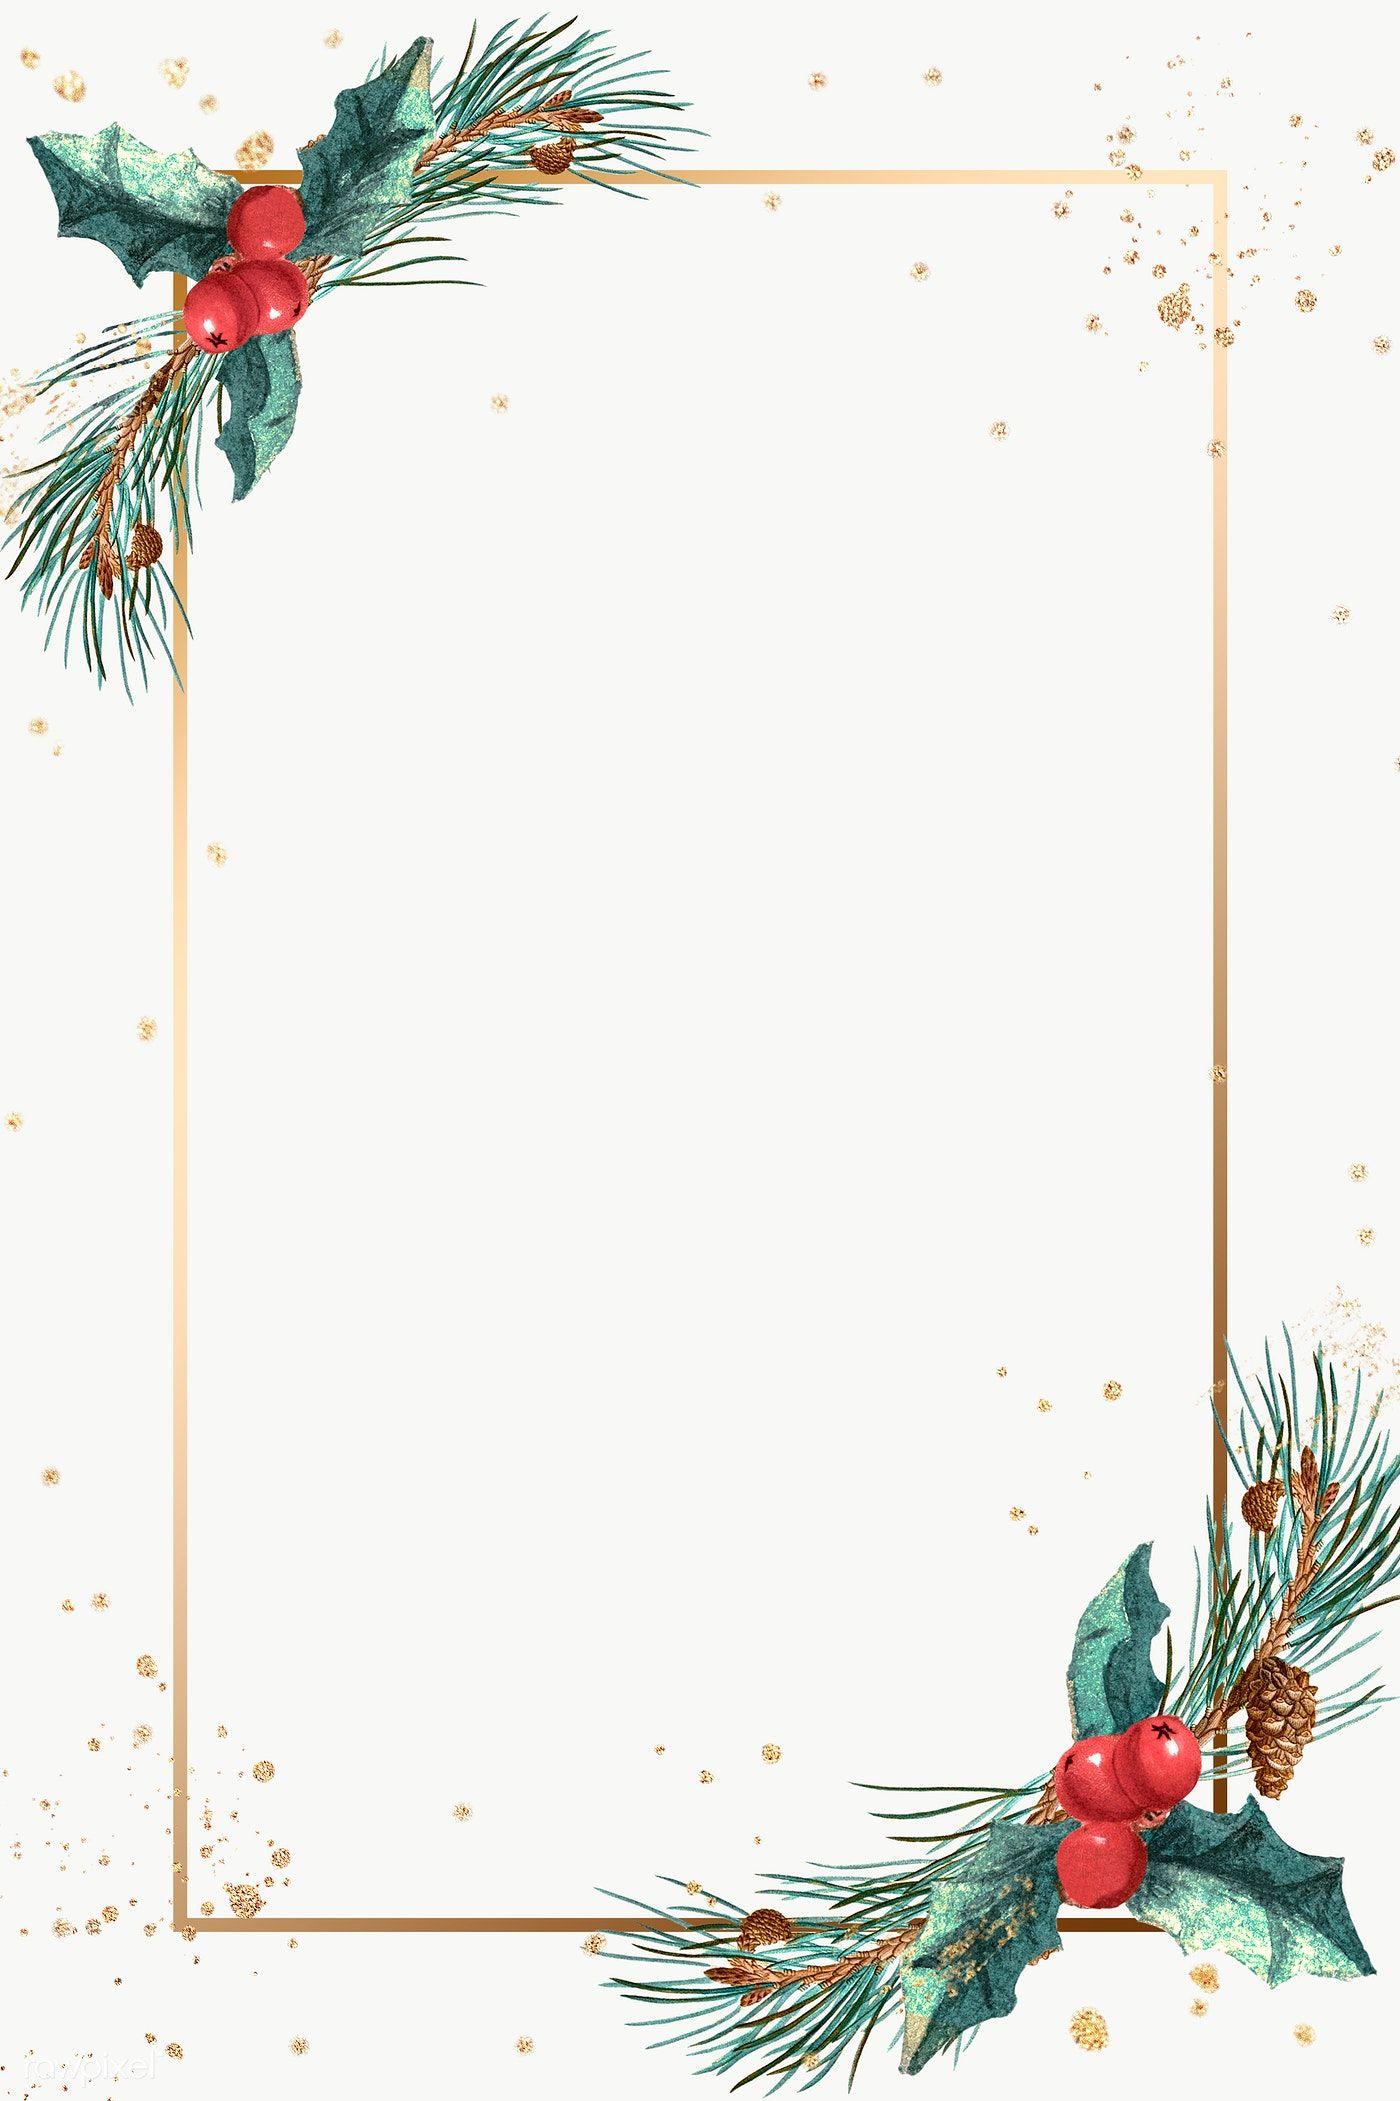 Download Premium Png Of Festive Golden Rectangle Frame Vector 1228702 Christmas Lettering Christmas Card Design Christmas Wallpaper Backgrounds